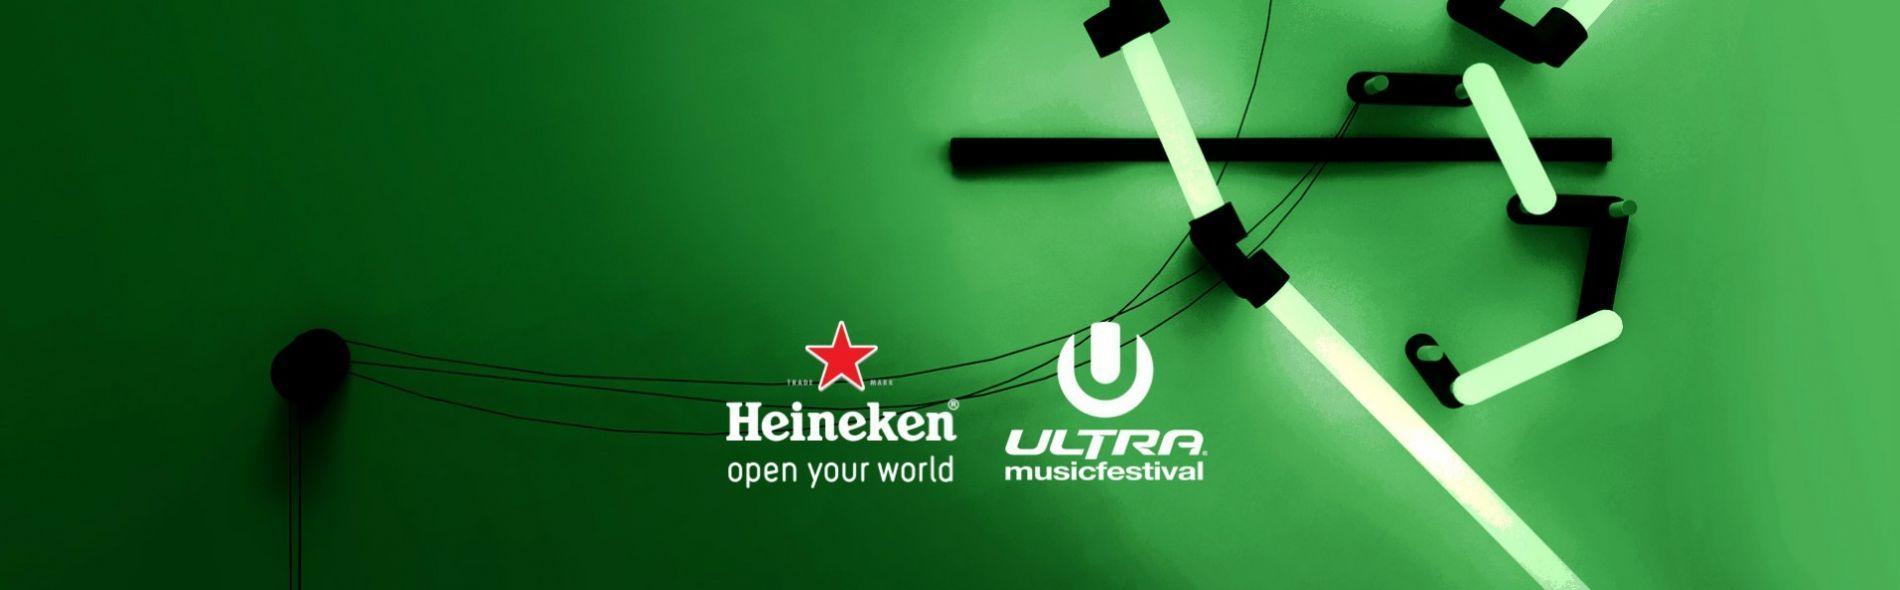 Heineken, Soundcloud & DJ Sam Feldt